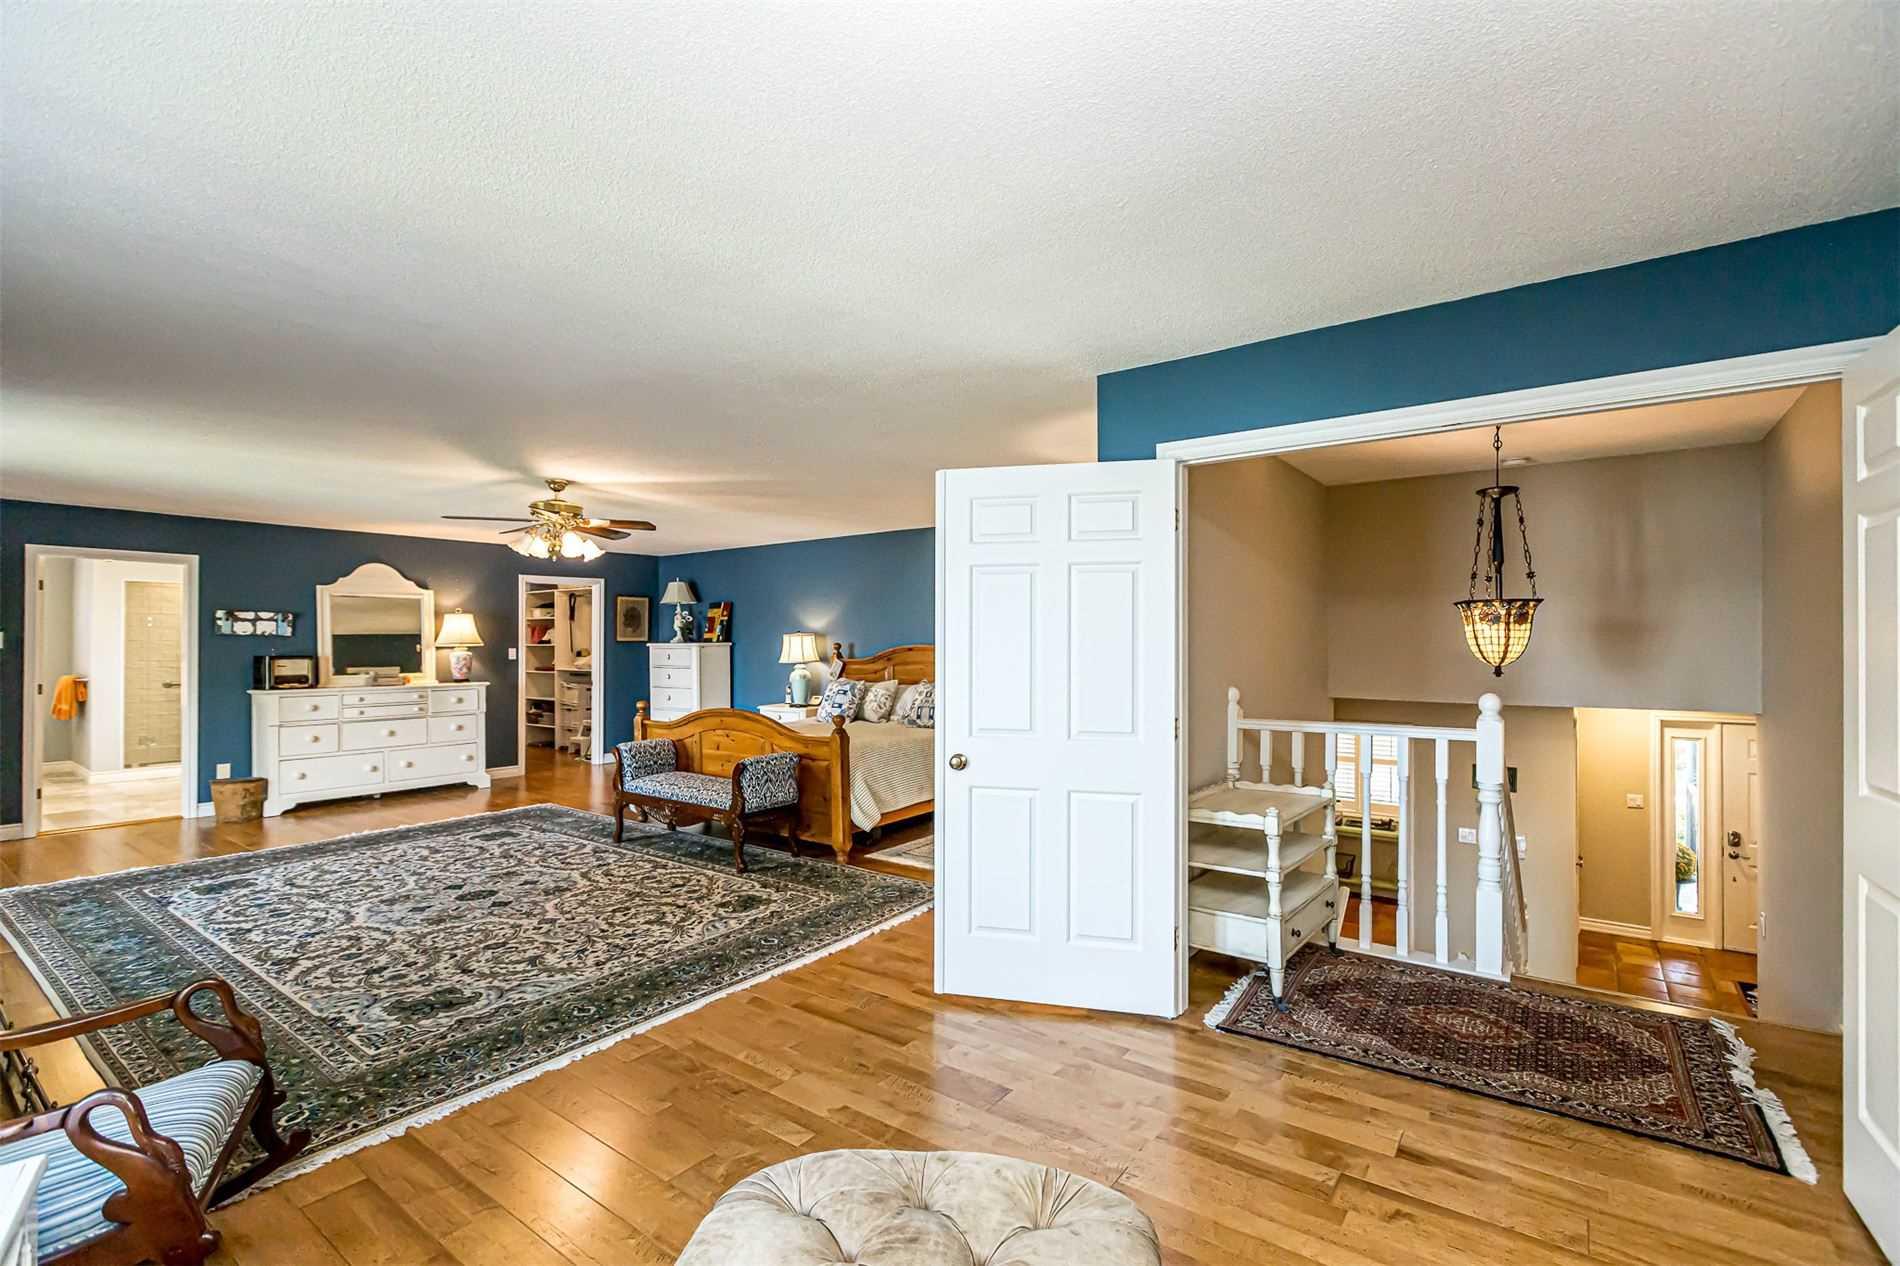 Detached house For Sale In Orillia - 83 Heyden Ave, Orillia, Ontario, Canada L3V6H1 , 5 Bedrooms Bedrooms, ,10 BathroomsBathrooms,Detached,For Sale,Heyden